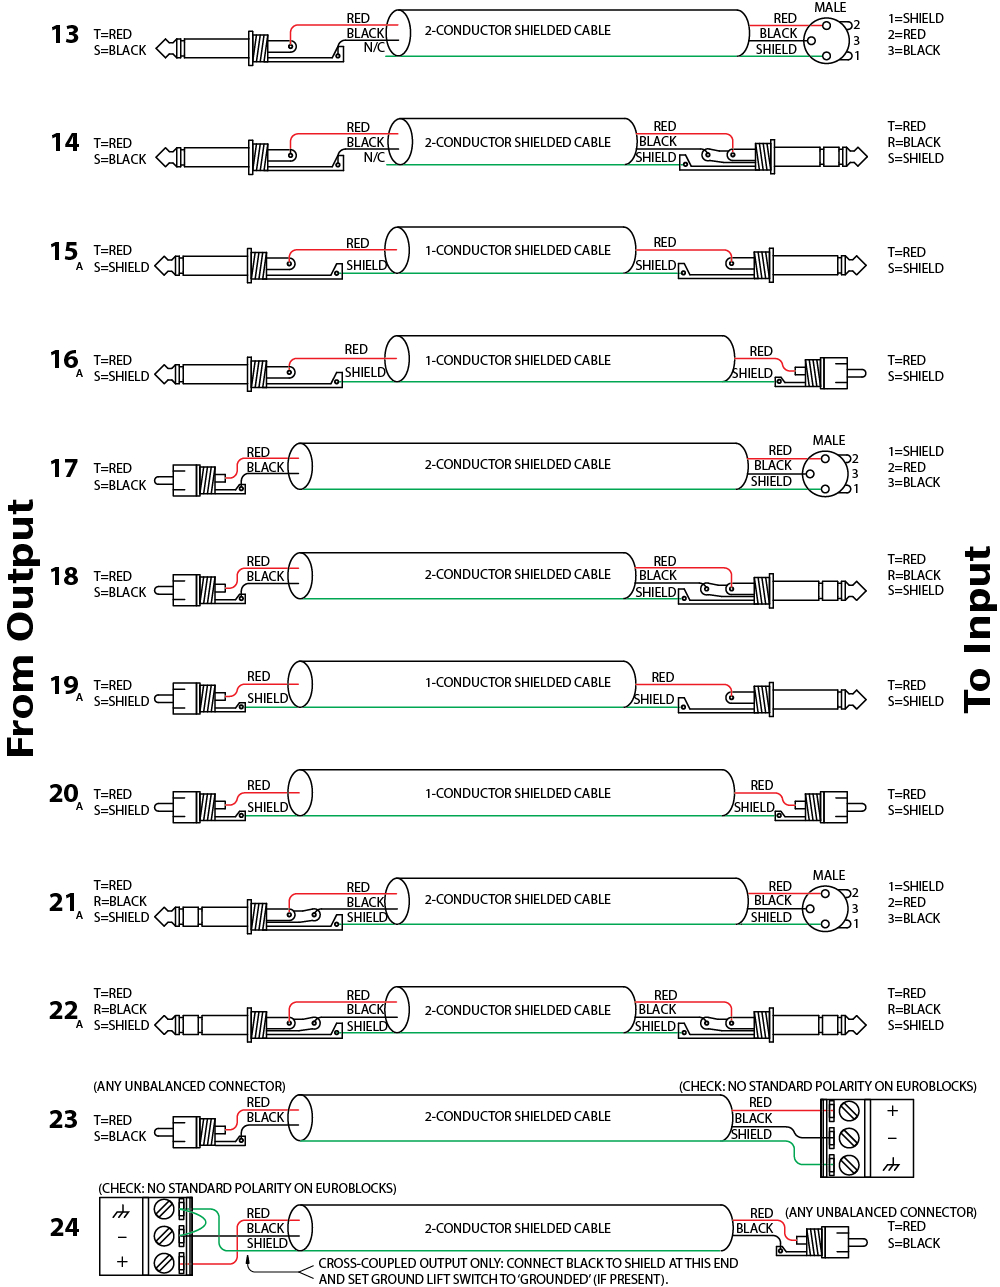 Insert Cable Xlr Wiring - Wiring Diagram Data Oreo - Xlr Connector Wiring Diagram